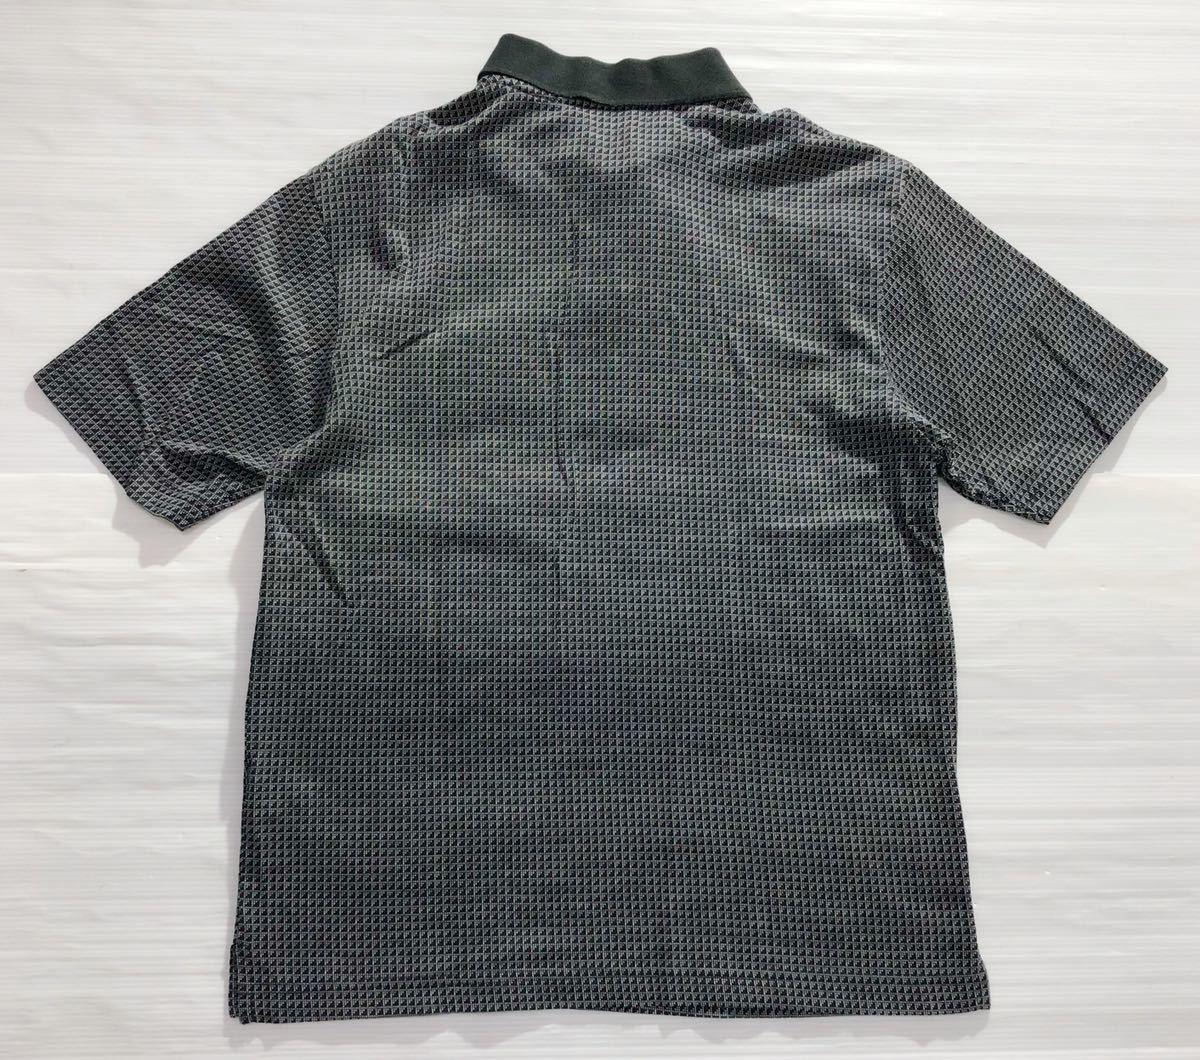 《le coq sportif GOLF ルコックゴルフ》ロゴ刺繍 総柄 半袖 ポロシャツ グレー×ブラック M_画像2